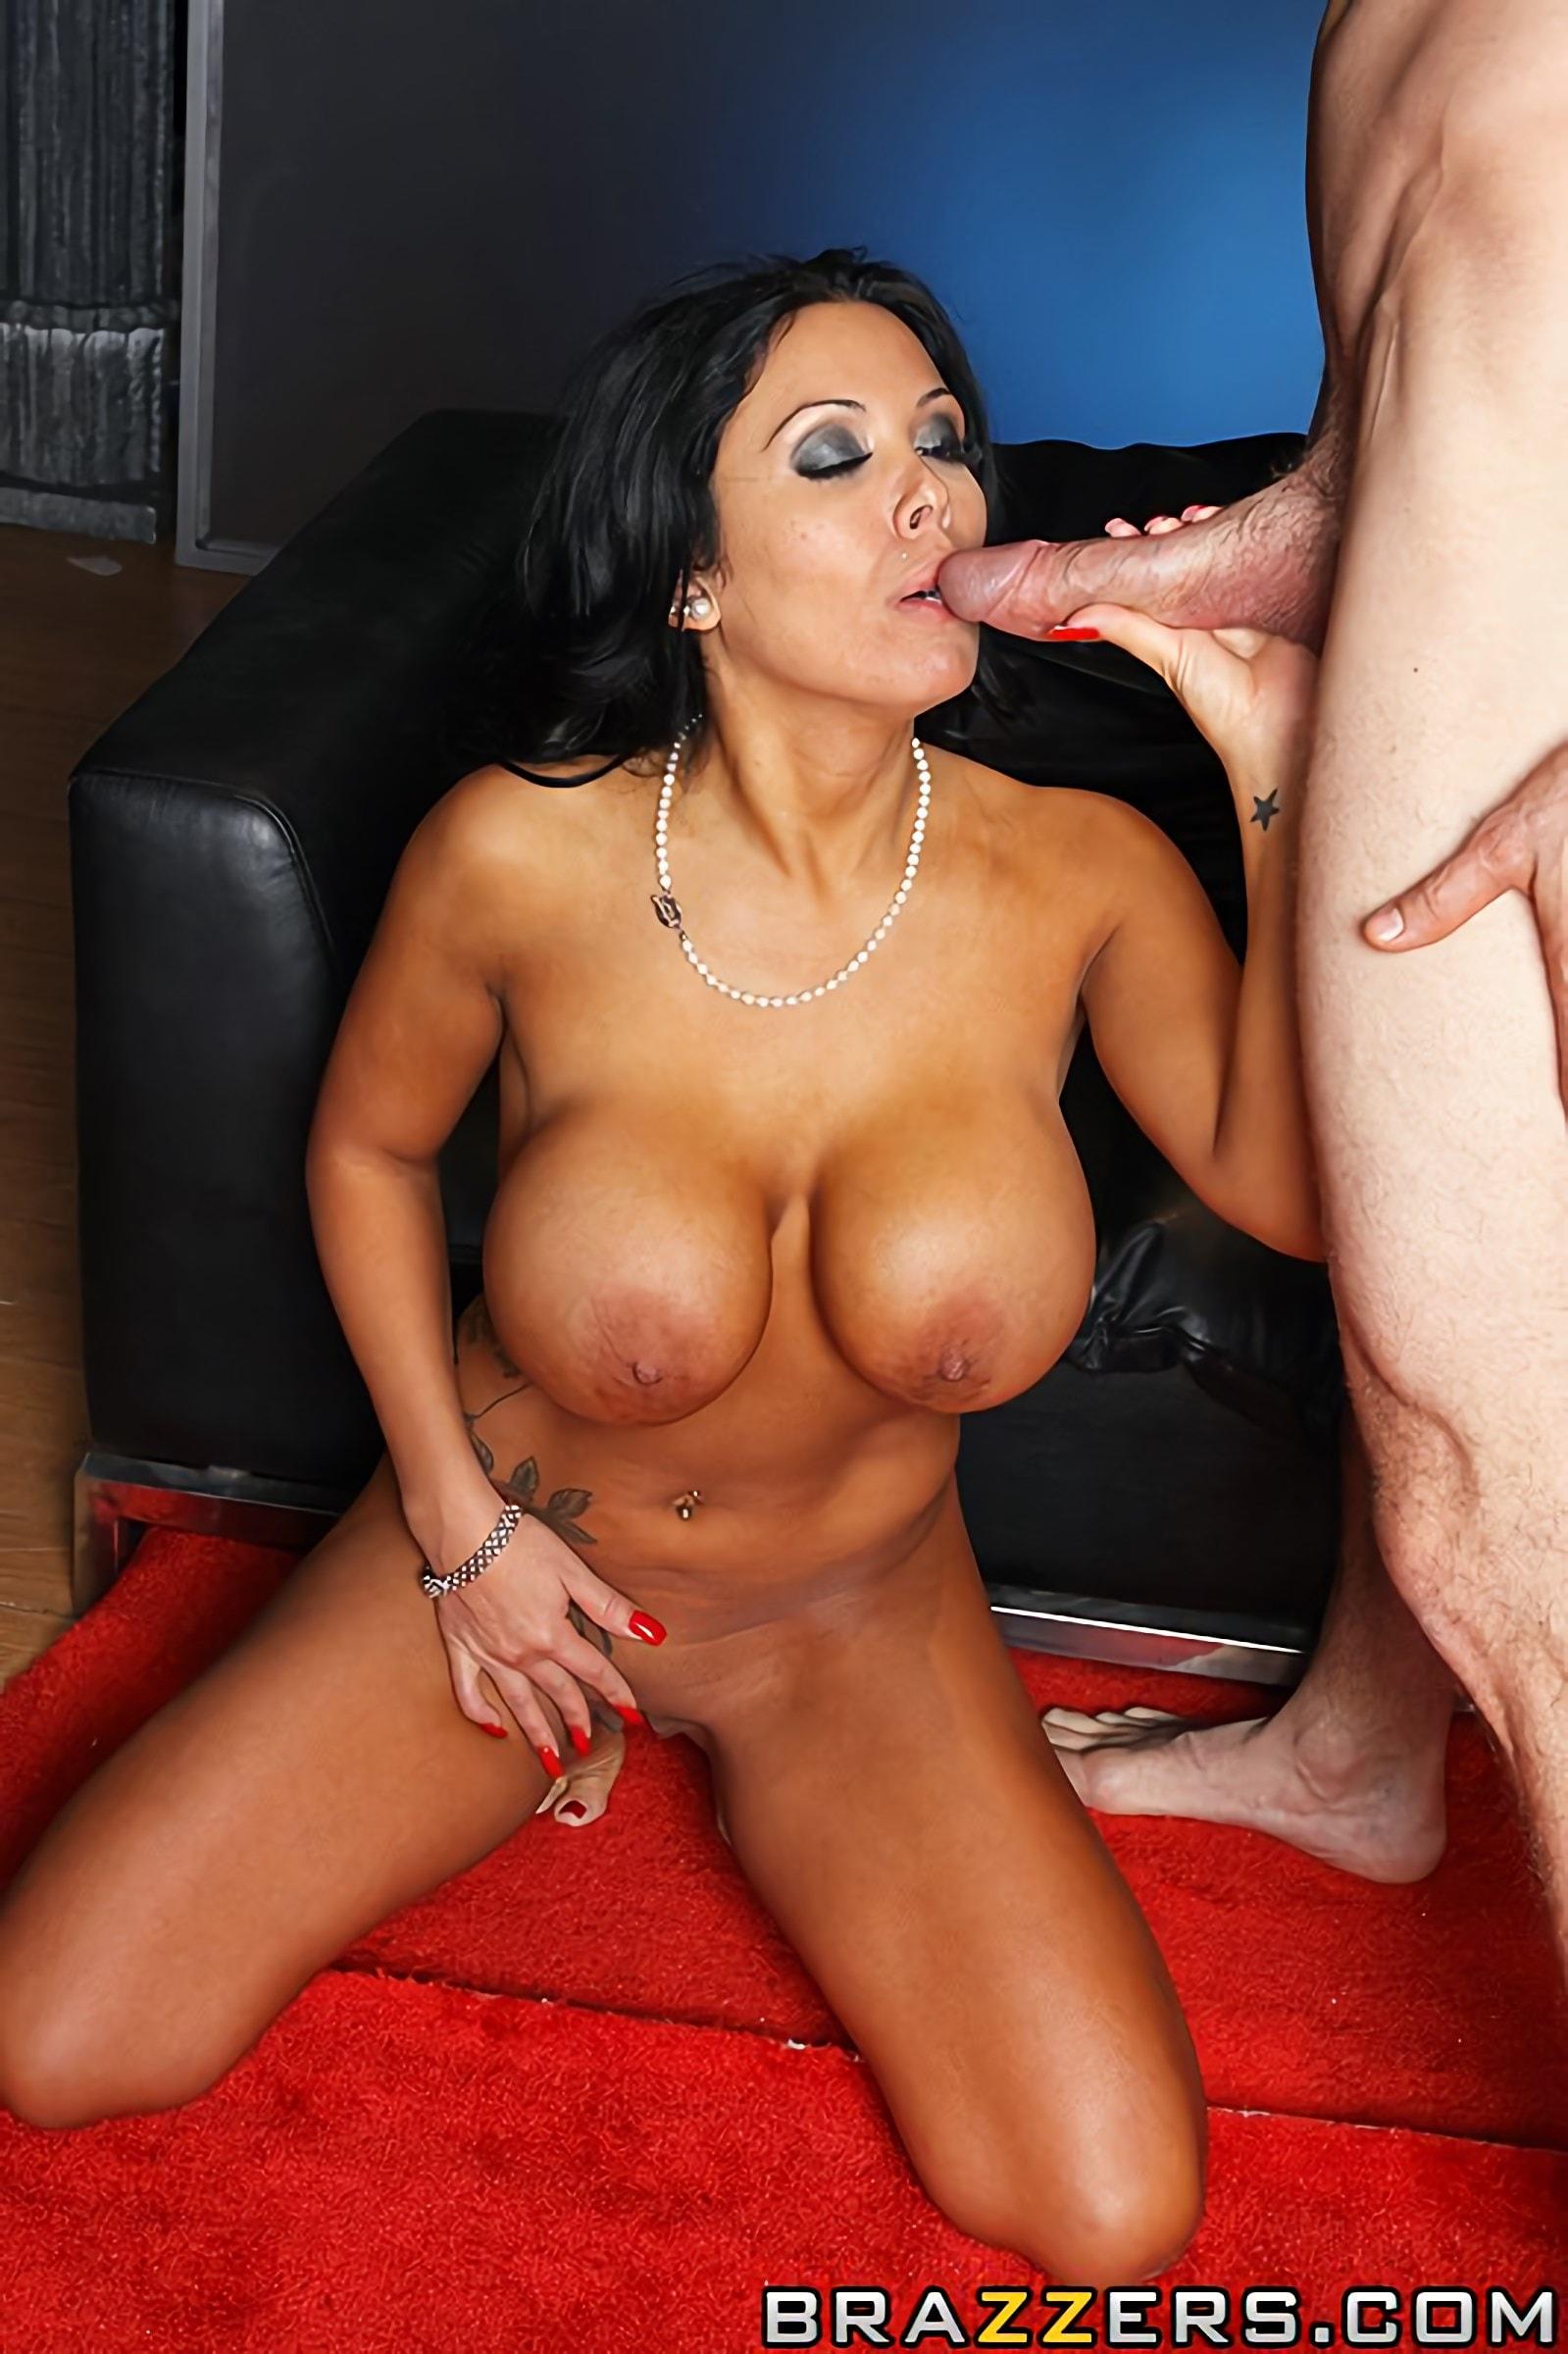 Sienna richardson milf free porn images